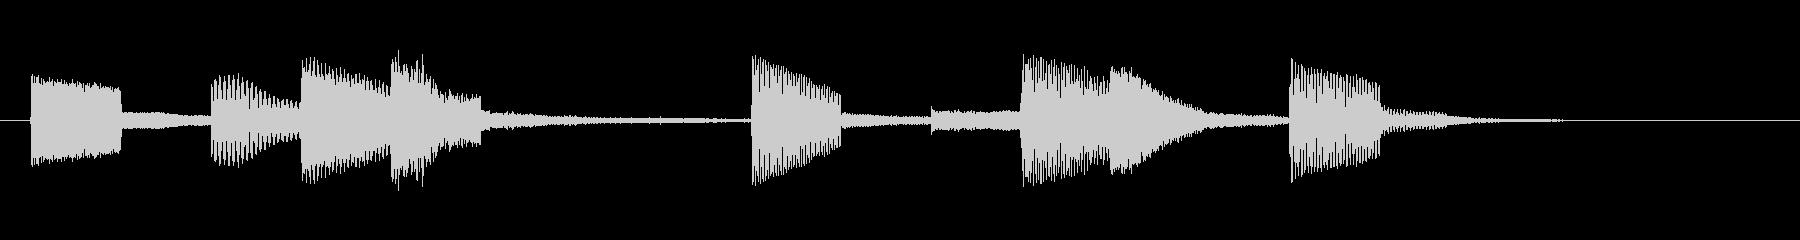 KANT近未来アラームサウンド246の未再生の波形